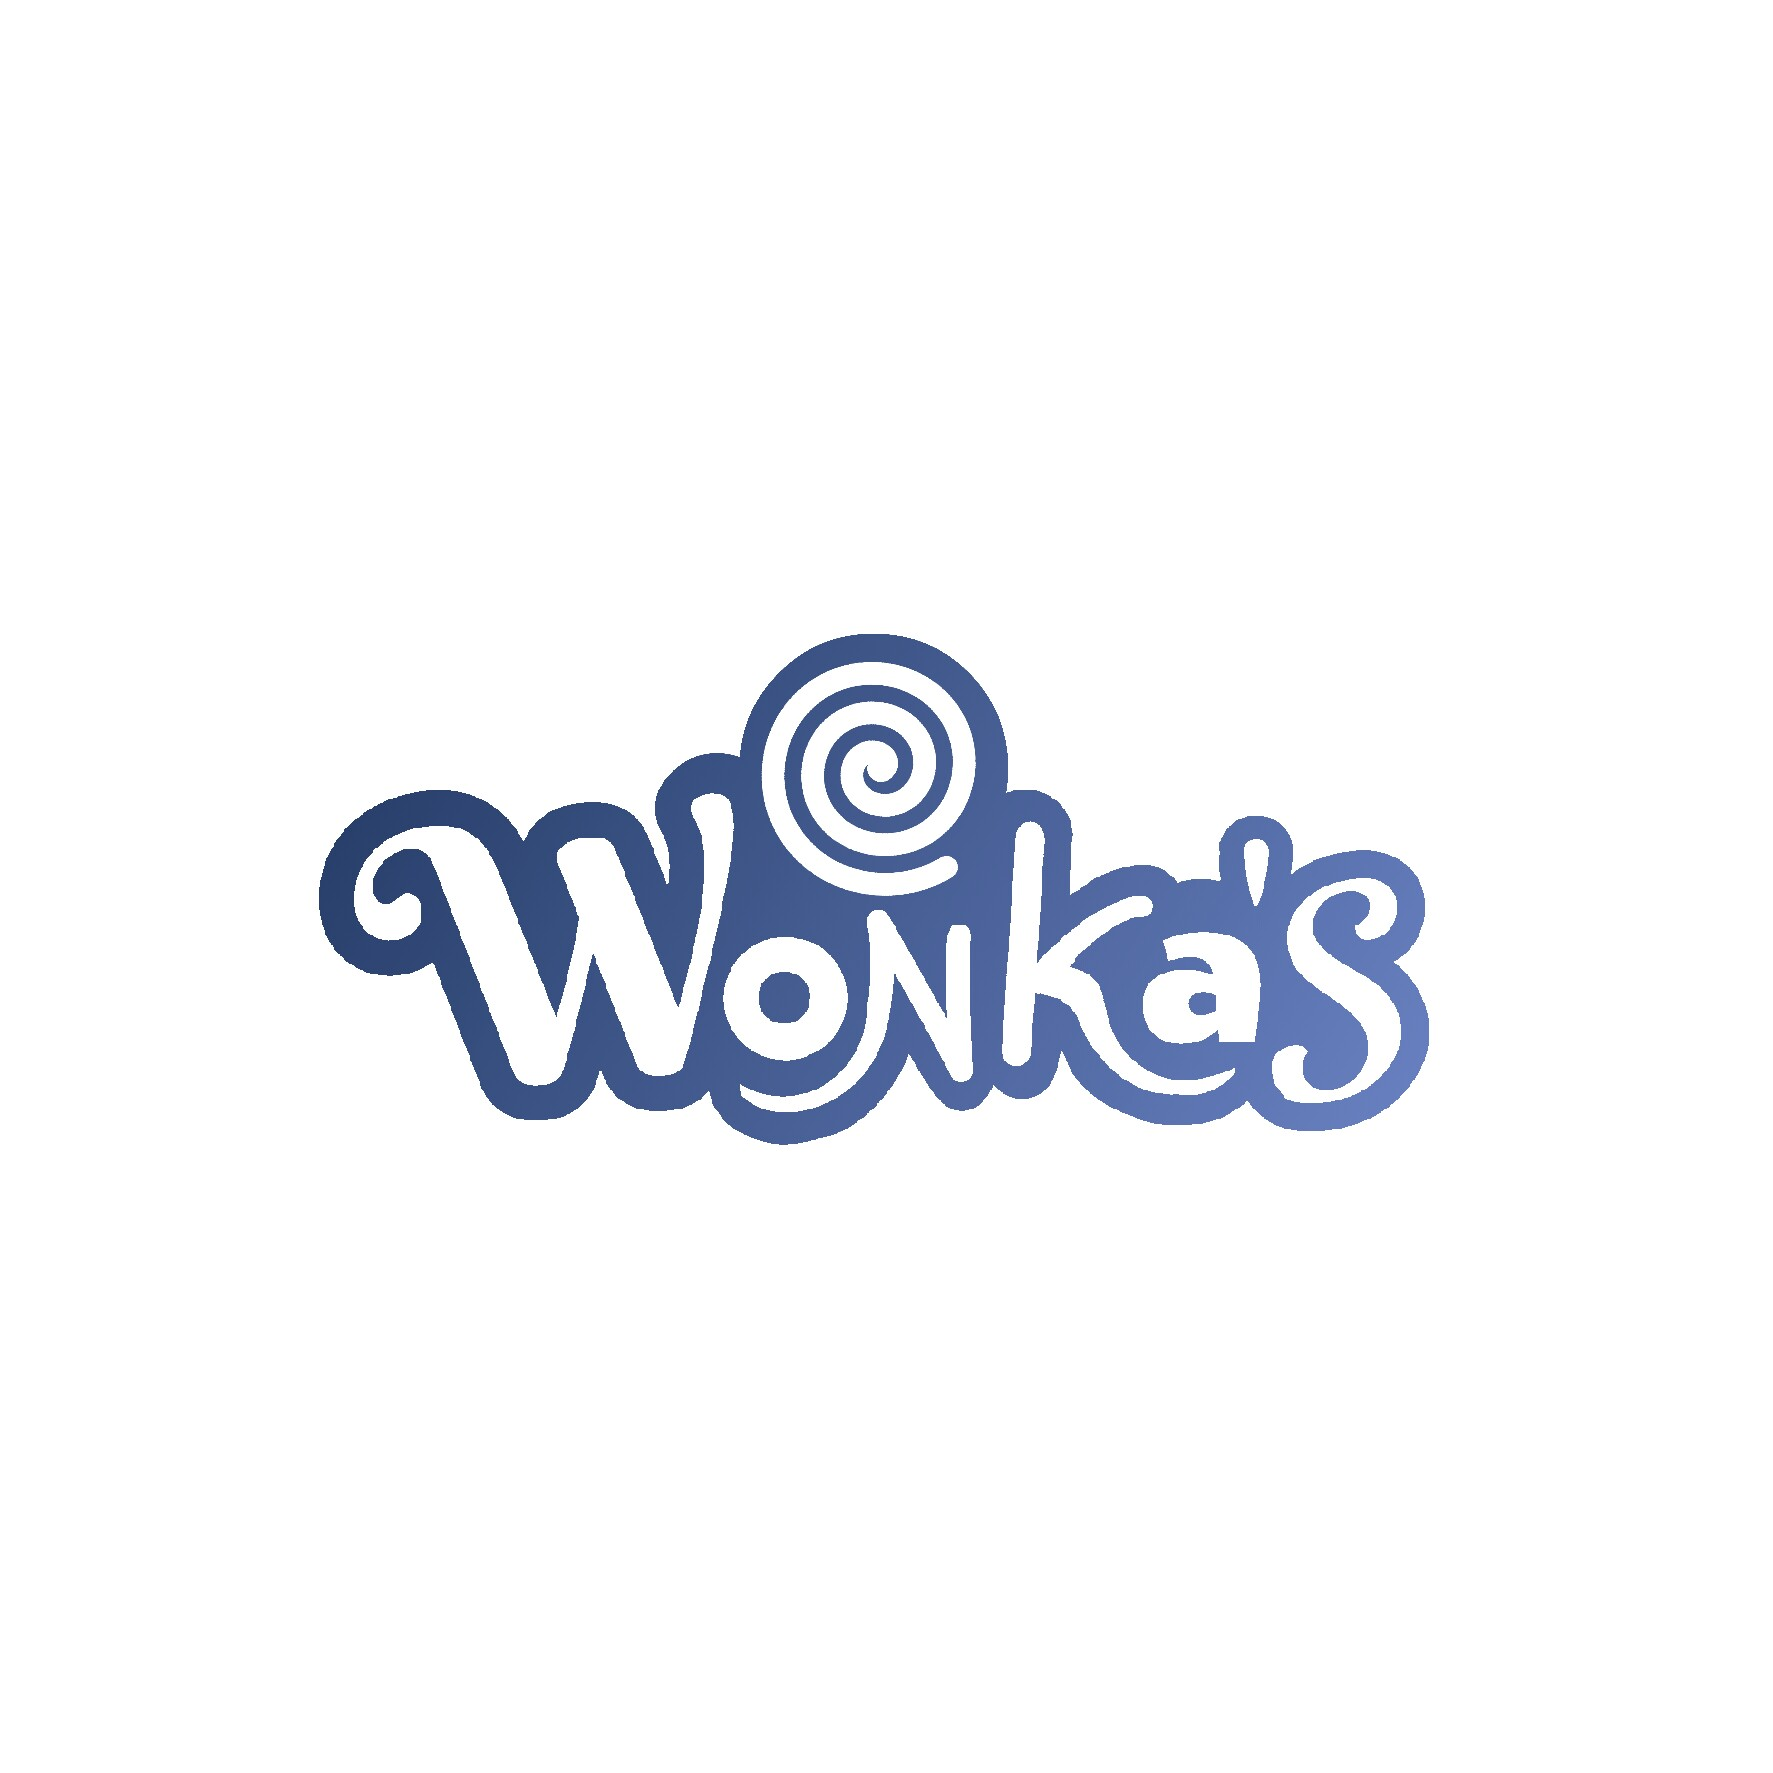 Разработка логотипа магазина сладостей со всего мира. фото f_6265a299897517f9.jpg